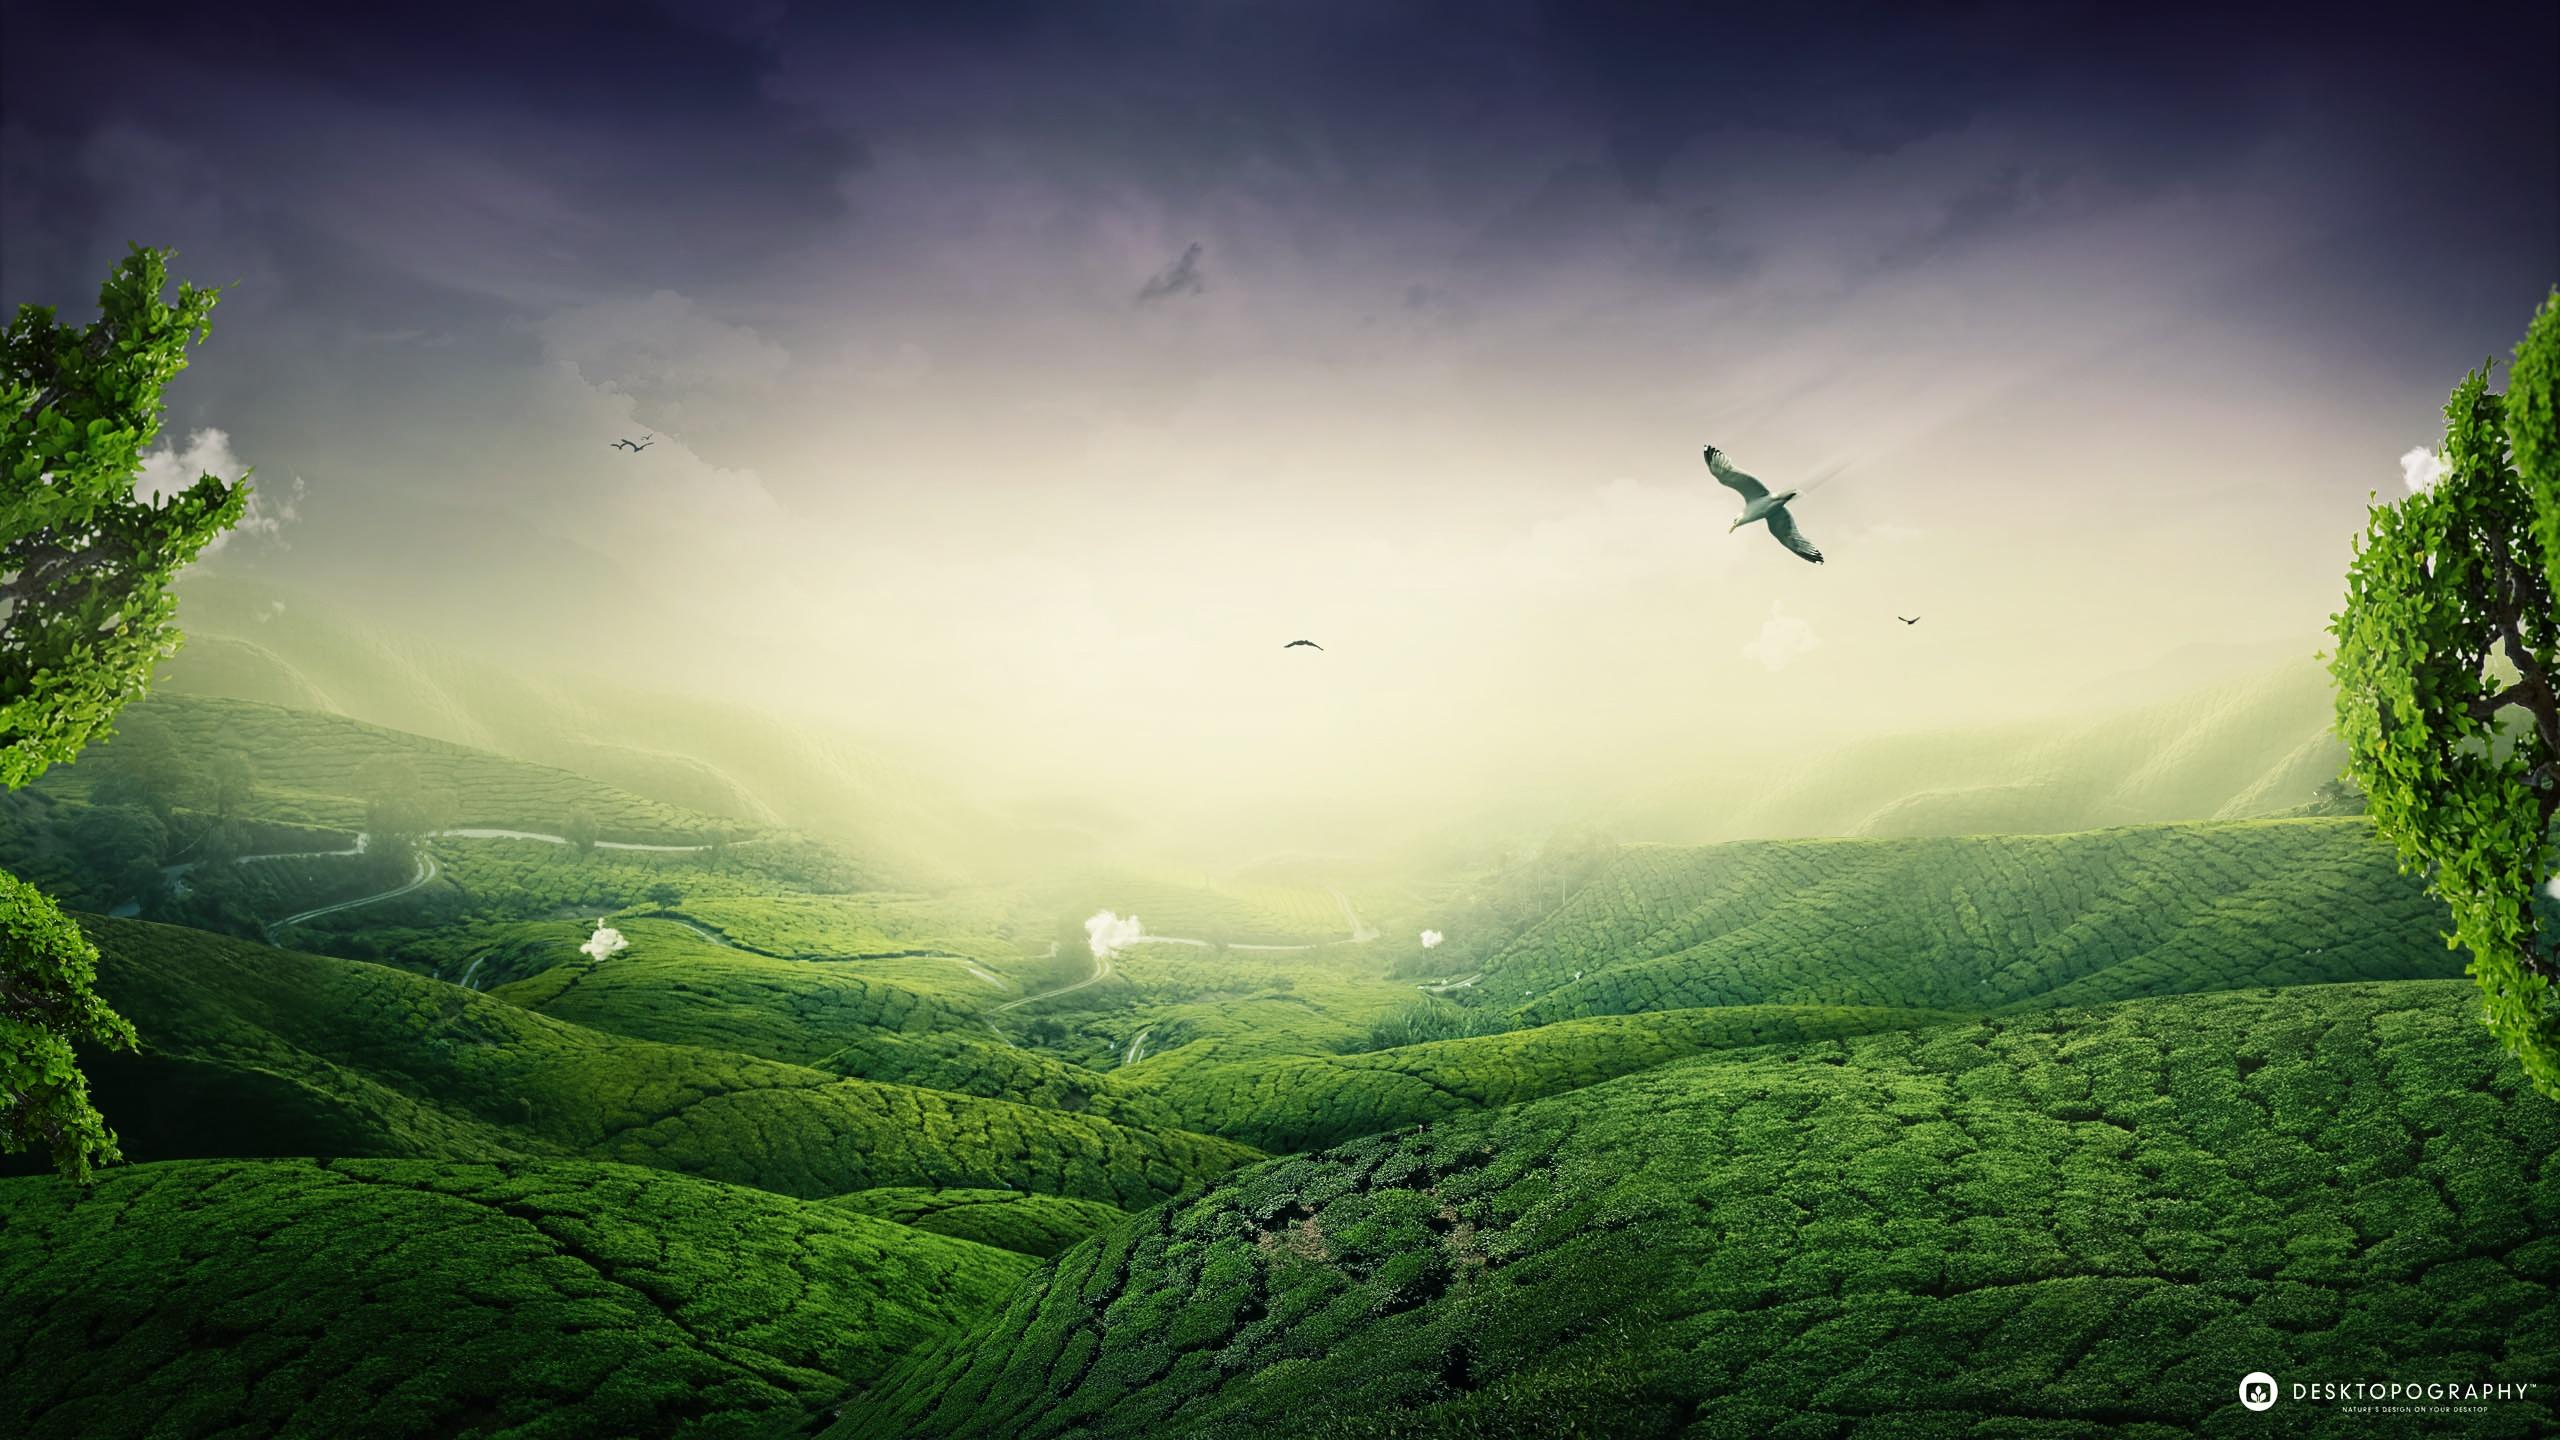 Nature wallpaper dark ocean wallpaper 1080p for desktop background - Hd Landscape Wallpaper Wallpapersafari